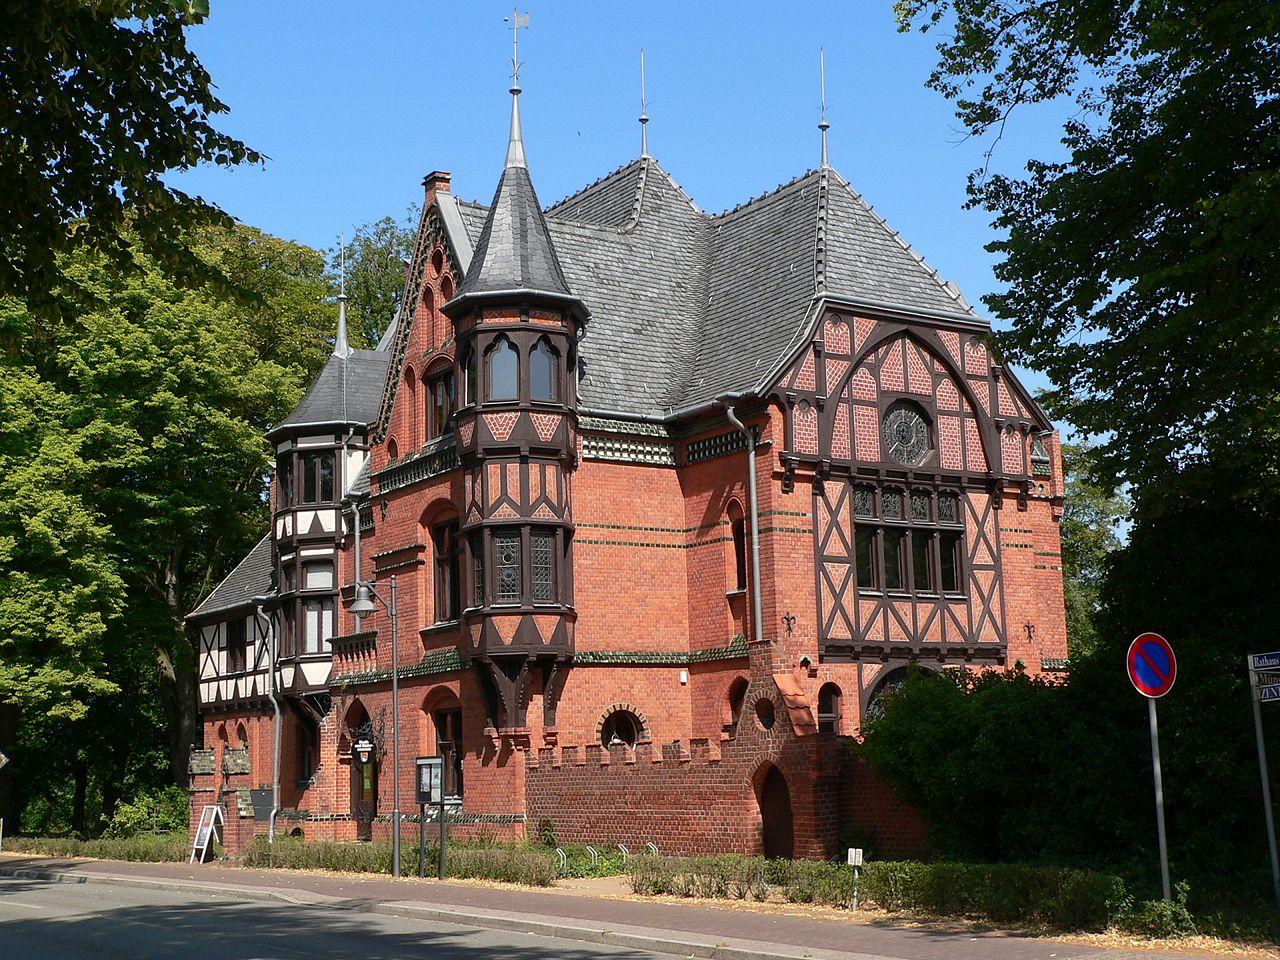 Bild Möckelhaus Bad Doberan